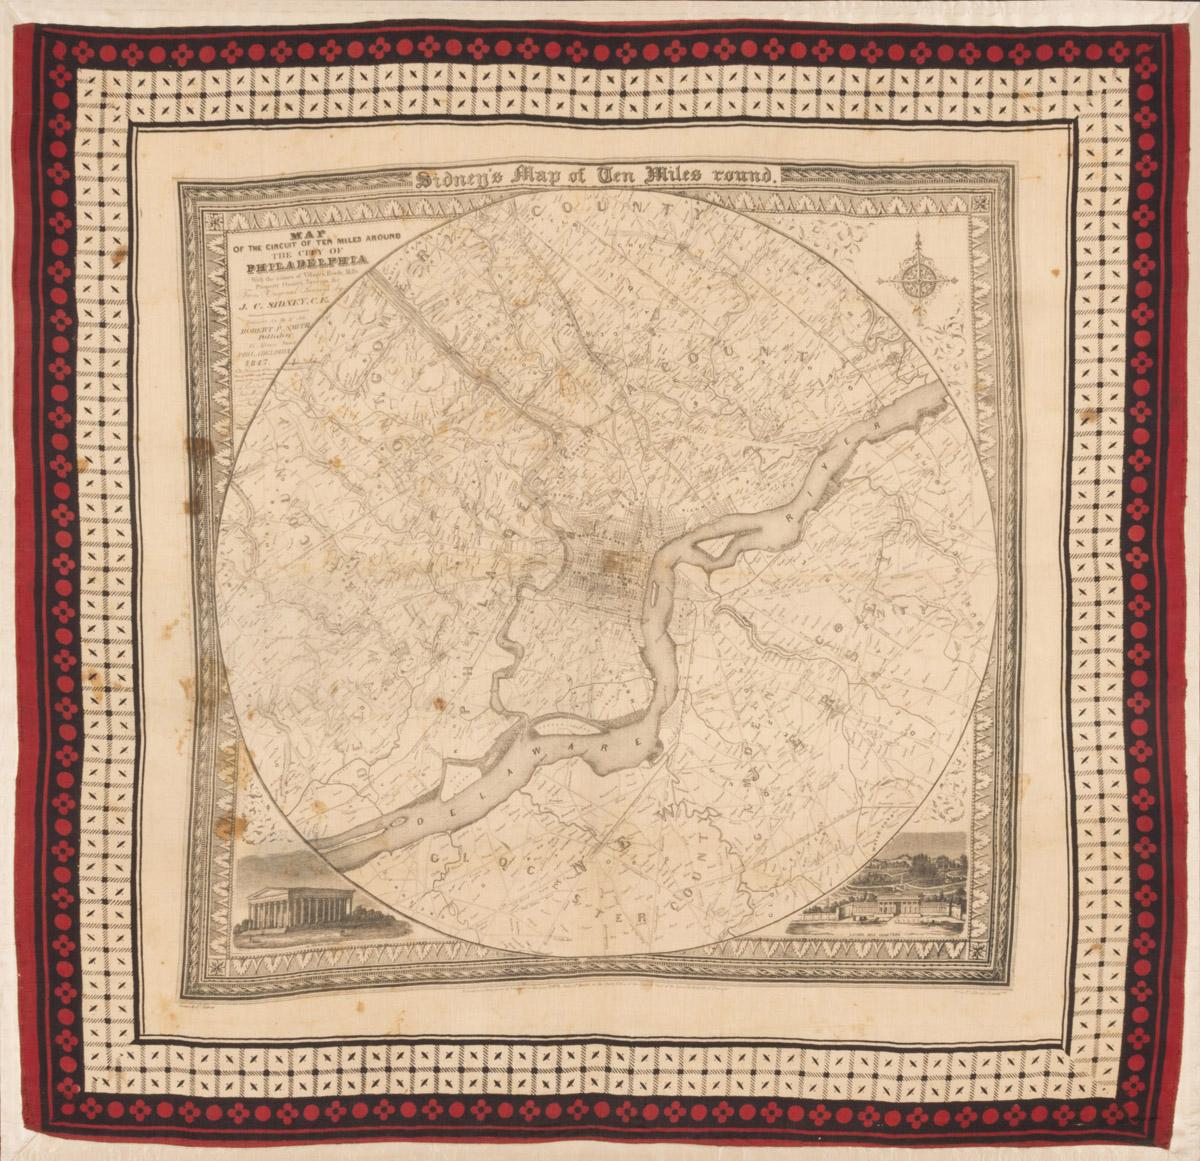 Industrial Age Maps Common Destinations